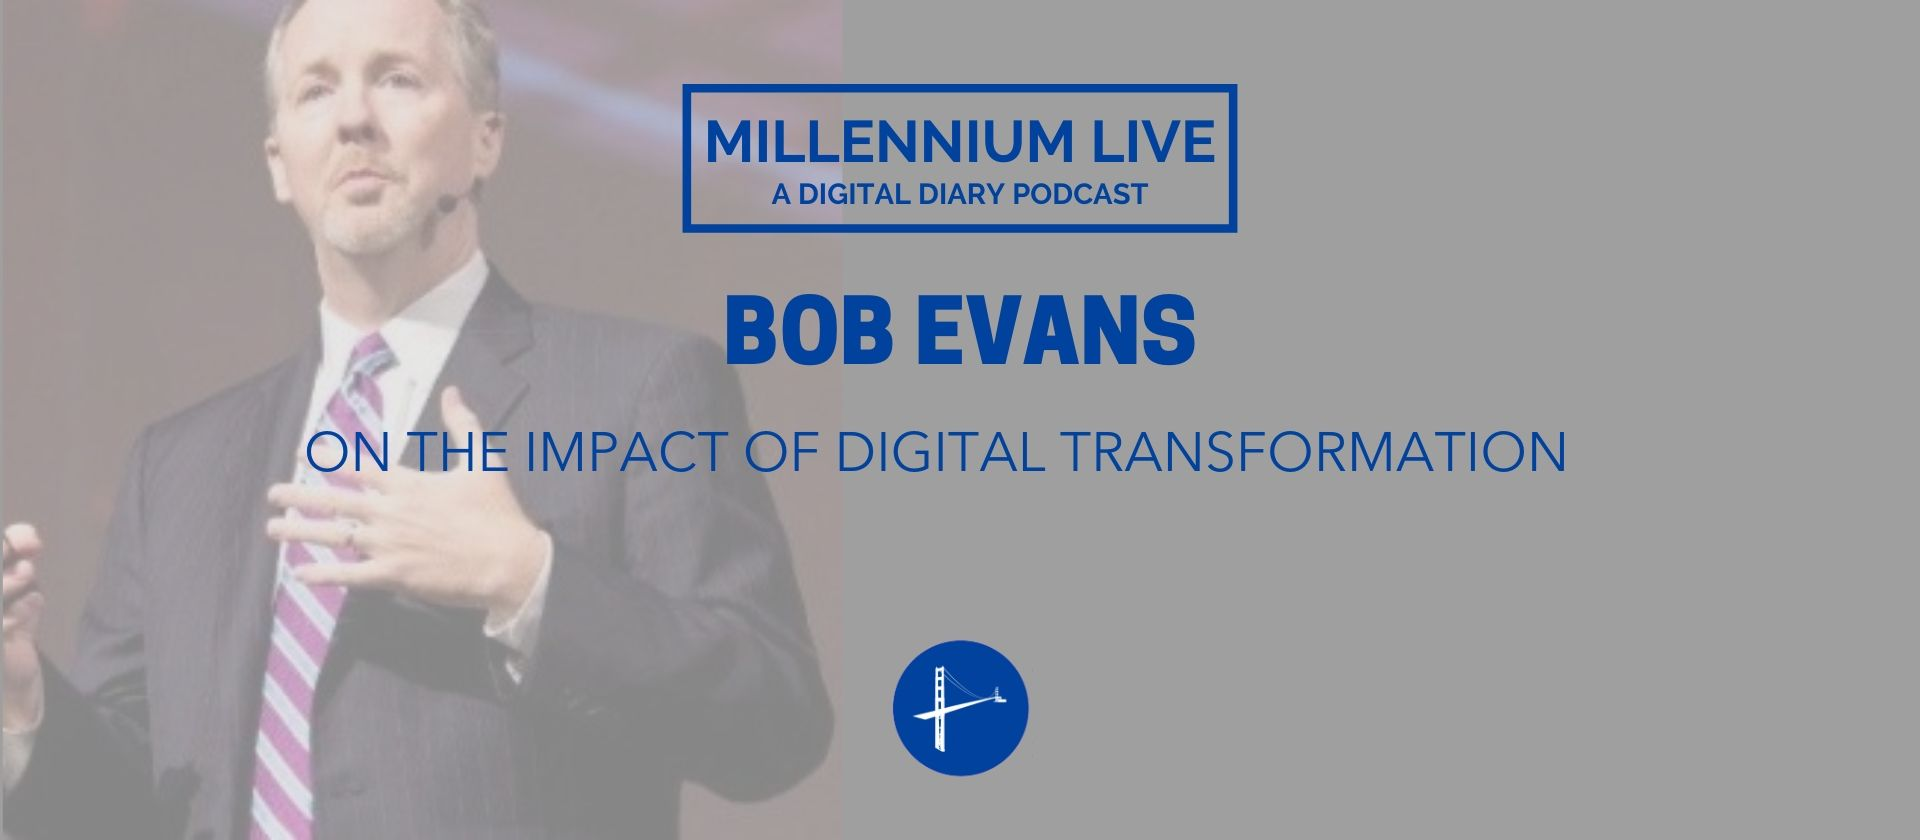 Bob Evans Podcast Digital Transformation Millennium Alliance